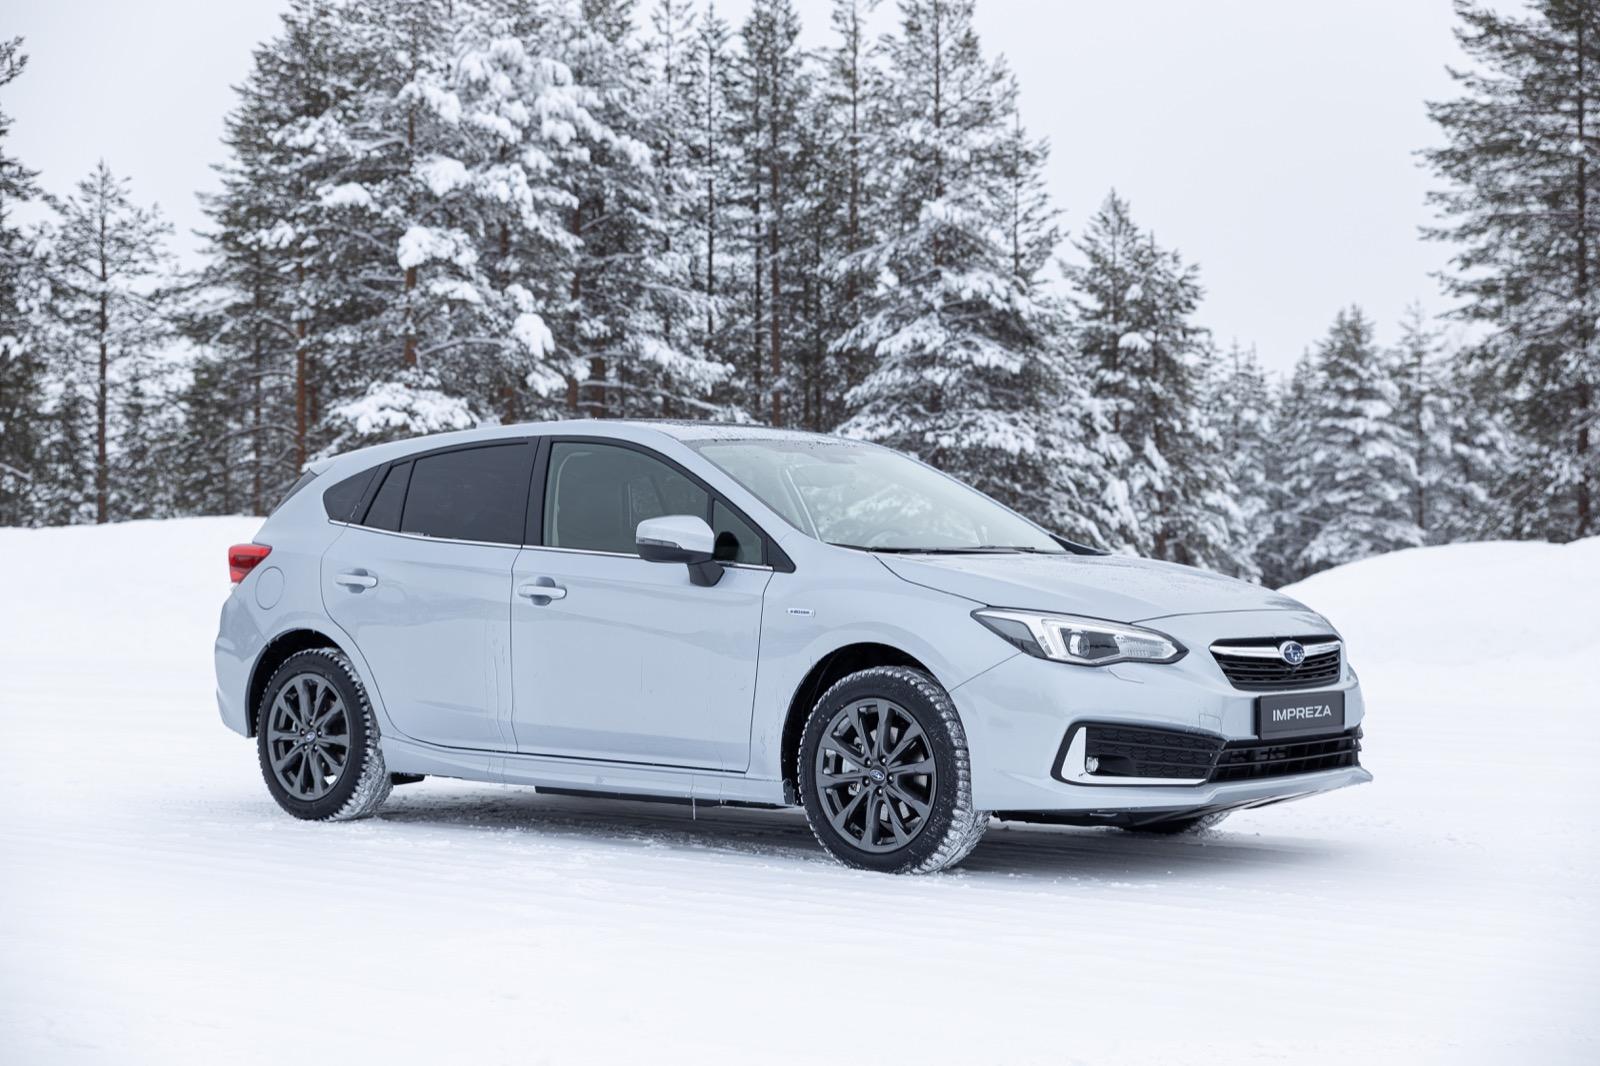 Subaru Impreza Hybrid 2